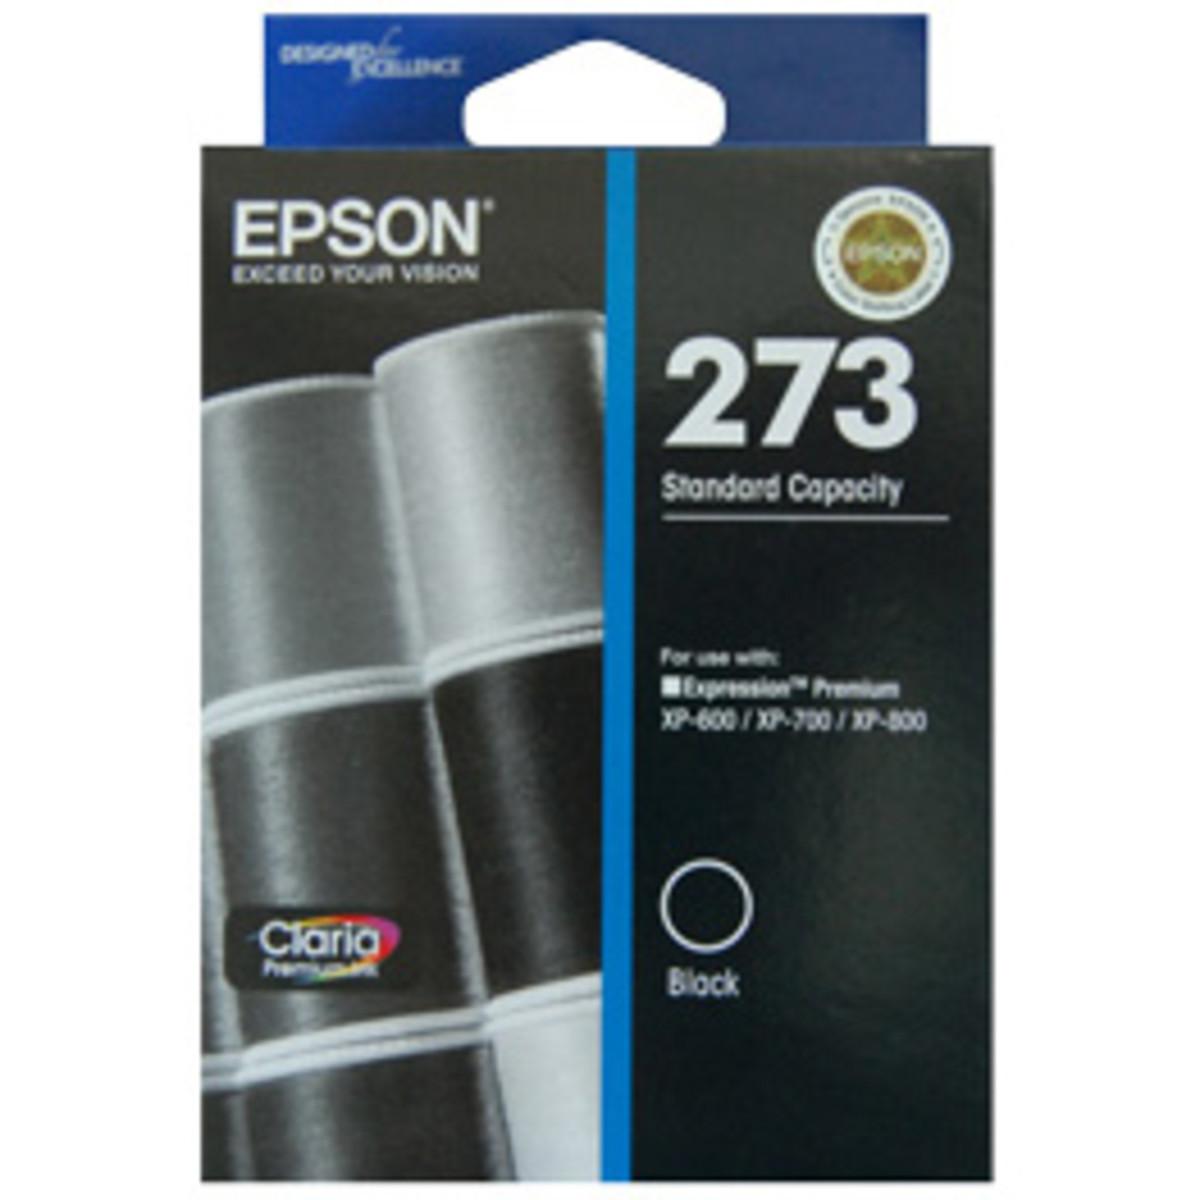 Epson 273 Black Ink Cartridge